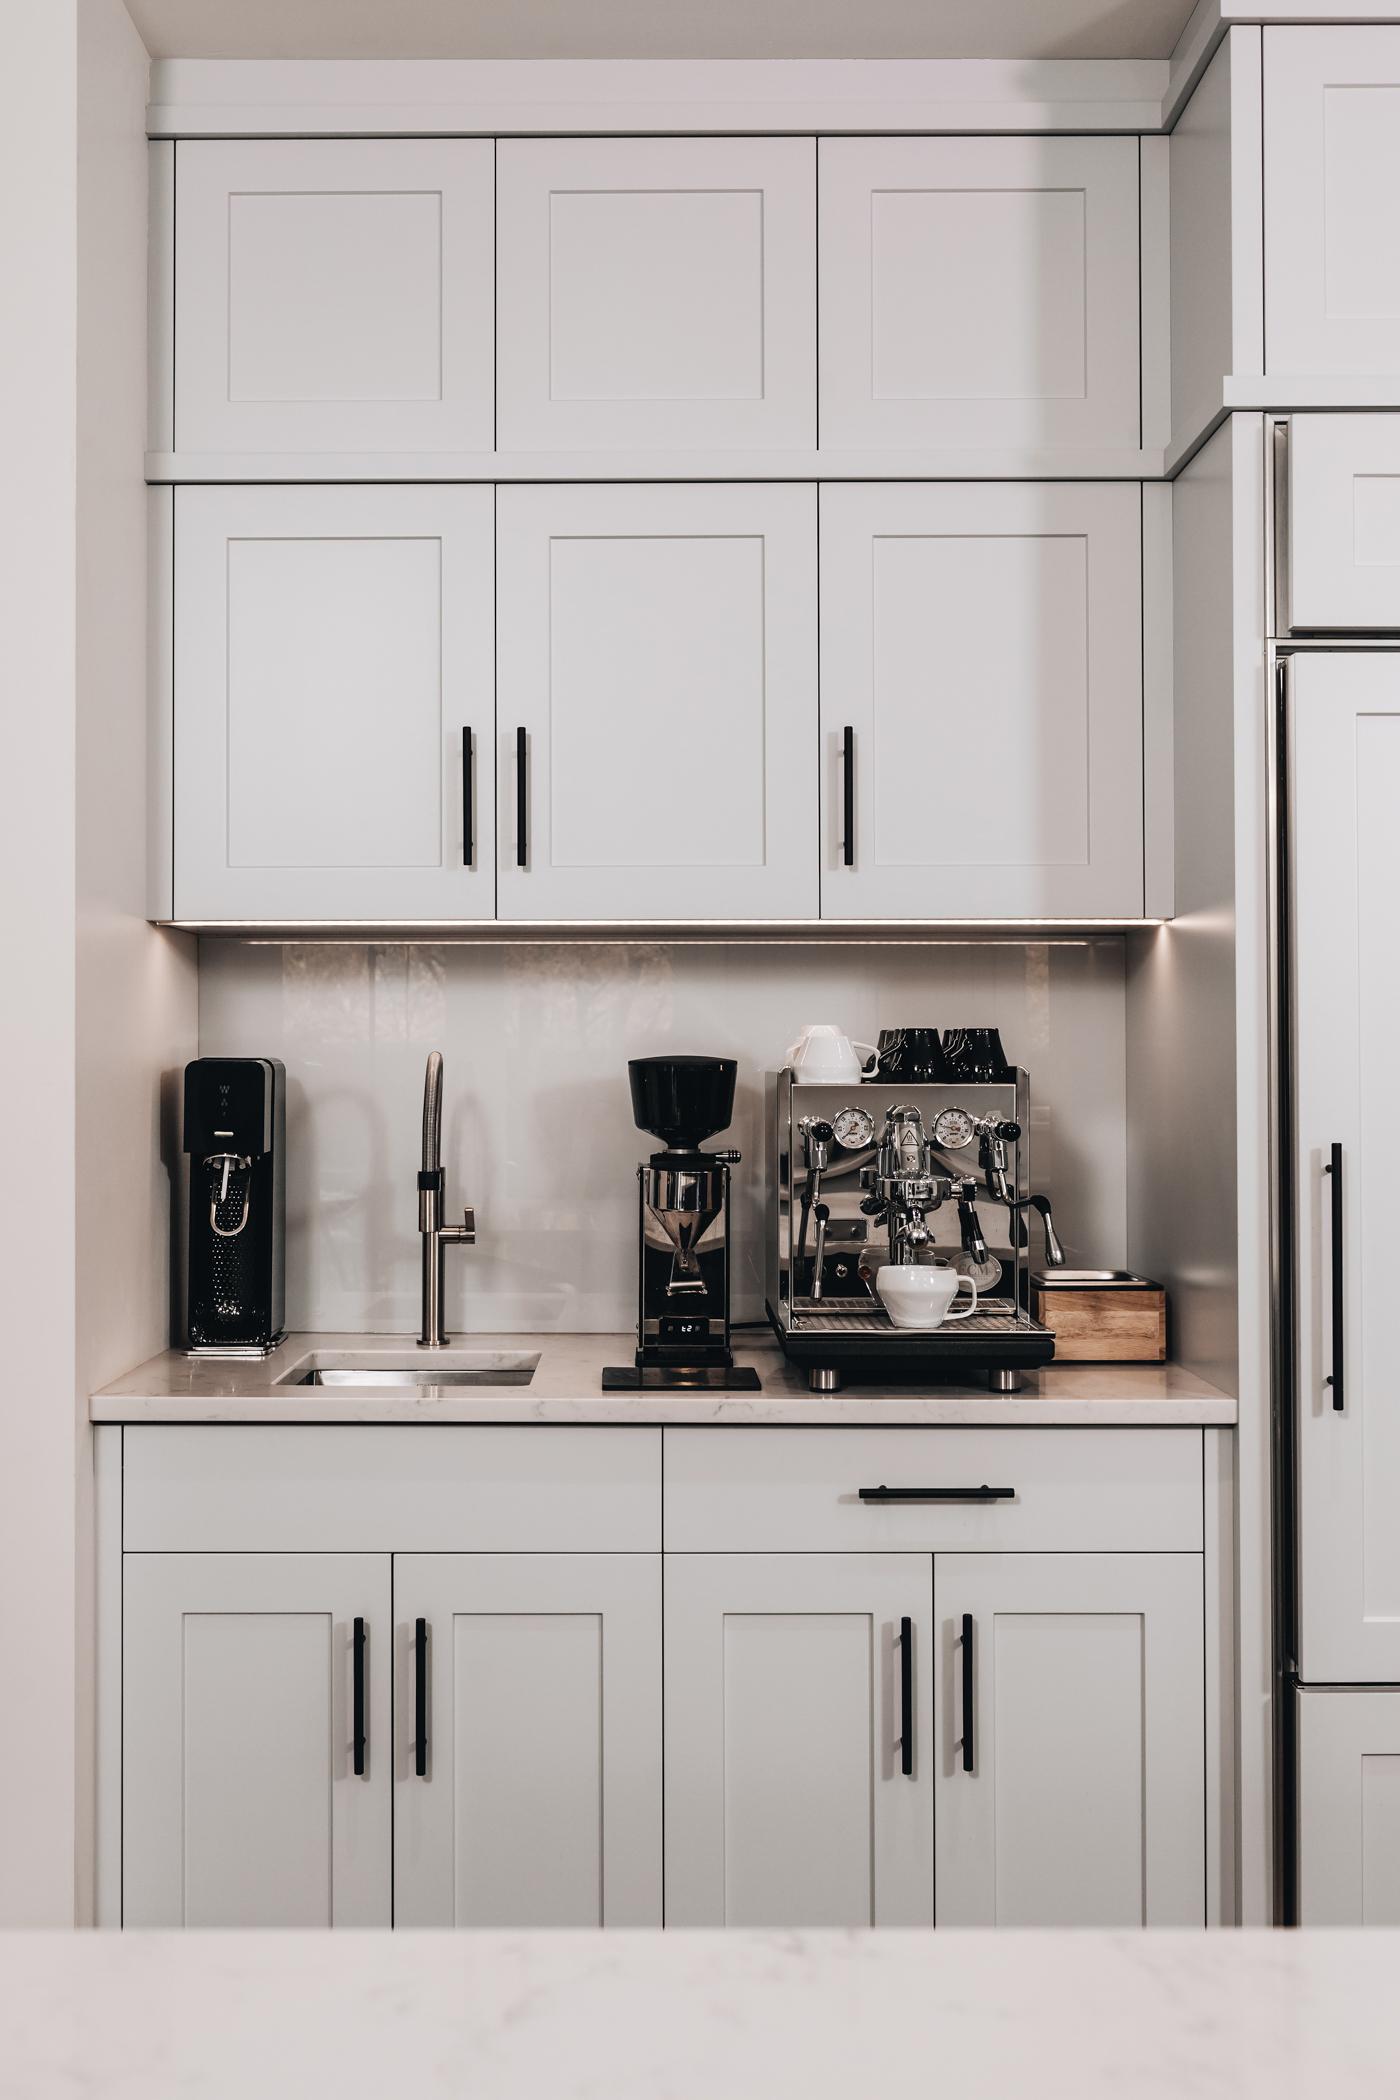 Constructing Custom Coffee Bar in The Kitchen | Kitchen Art Design